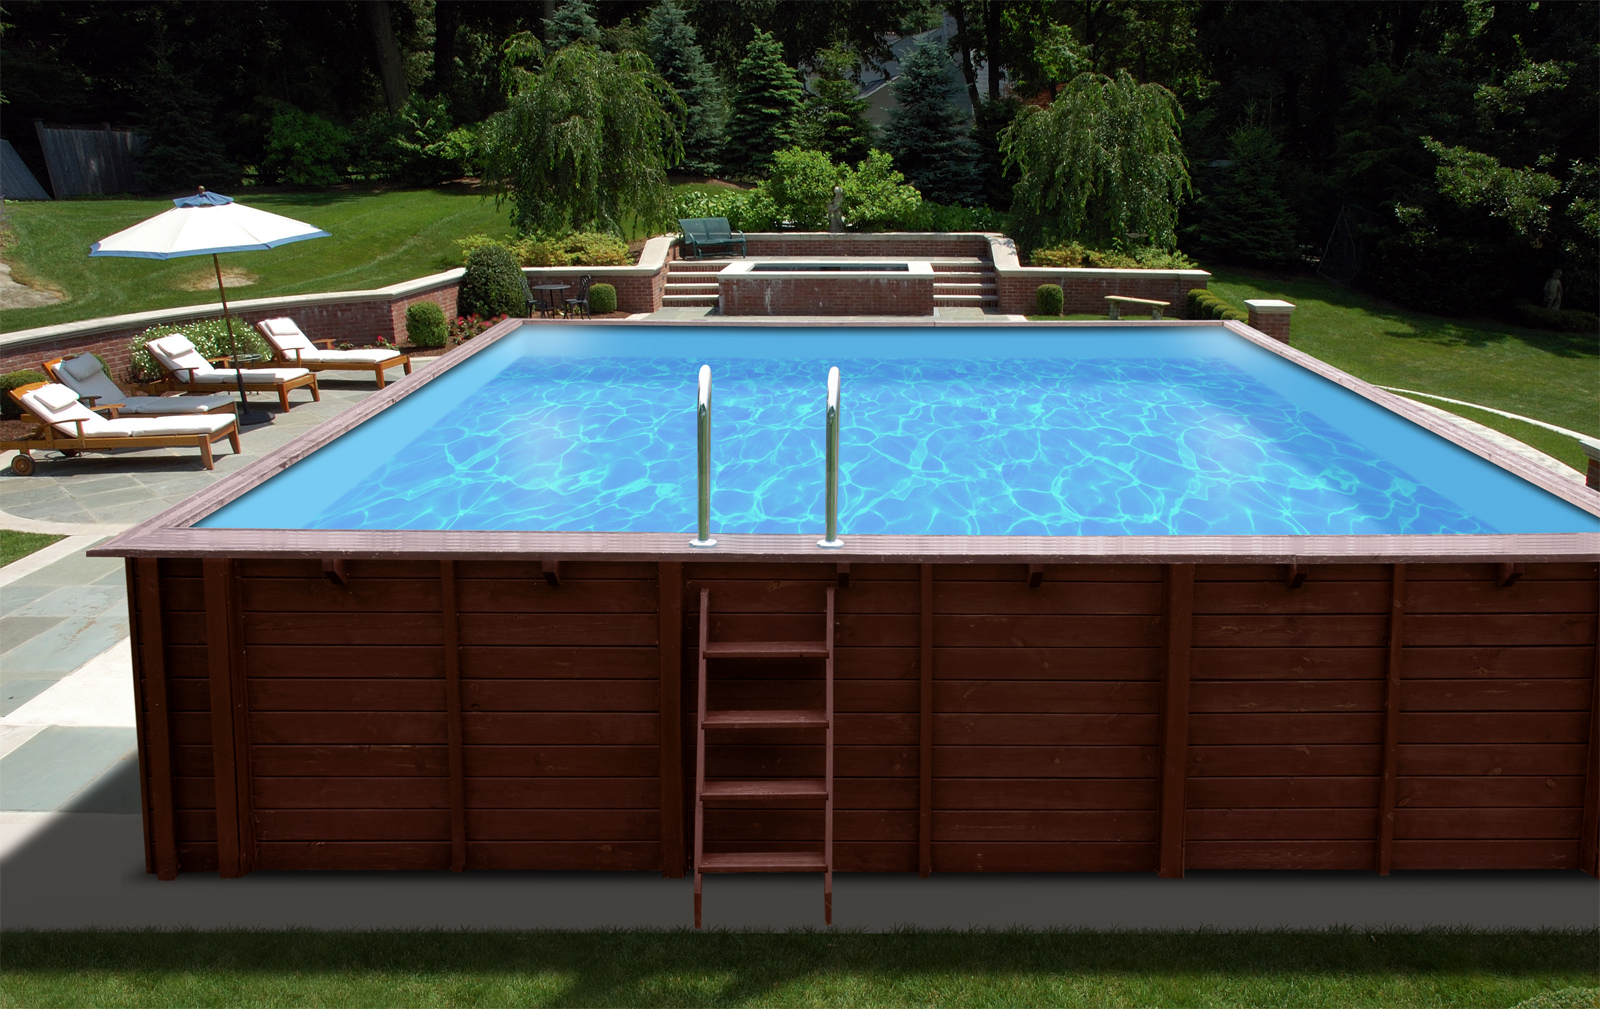 Houten zwembaden rechthoekig harmopool for Rechthoekig zwembad